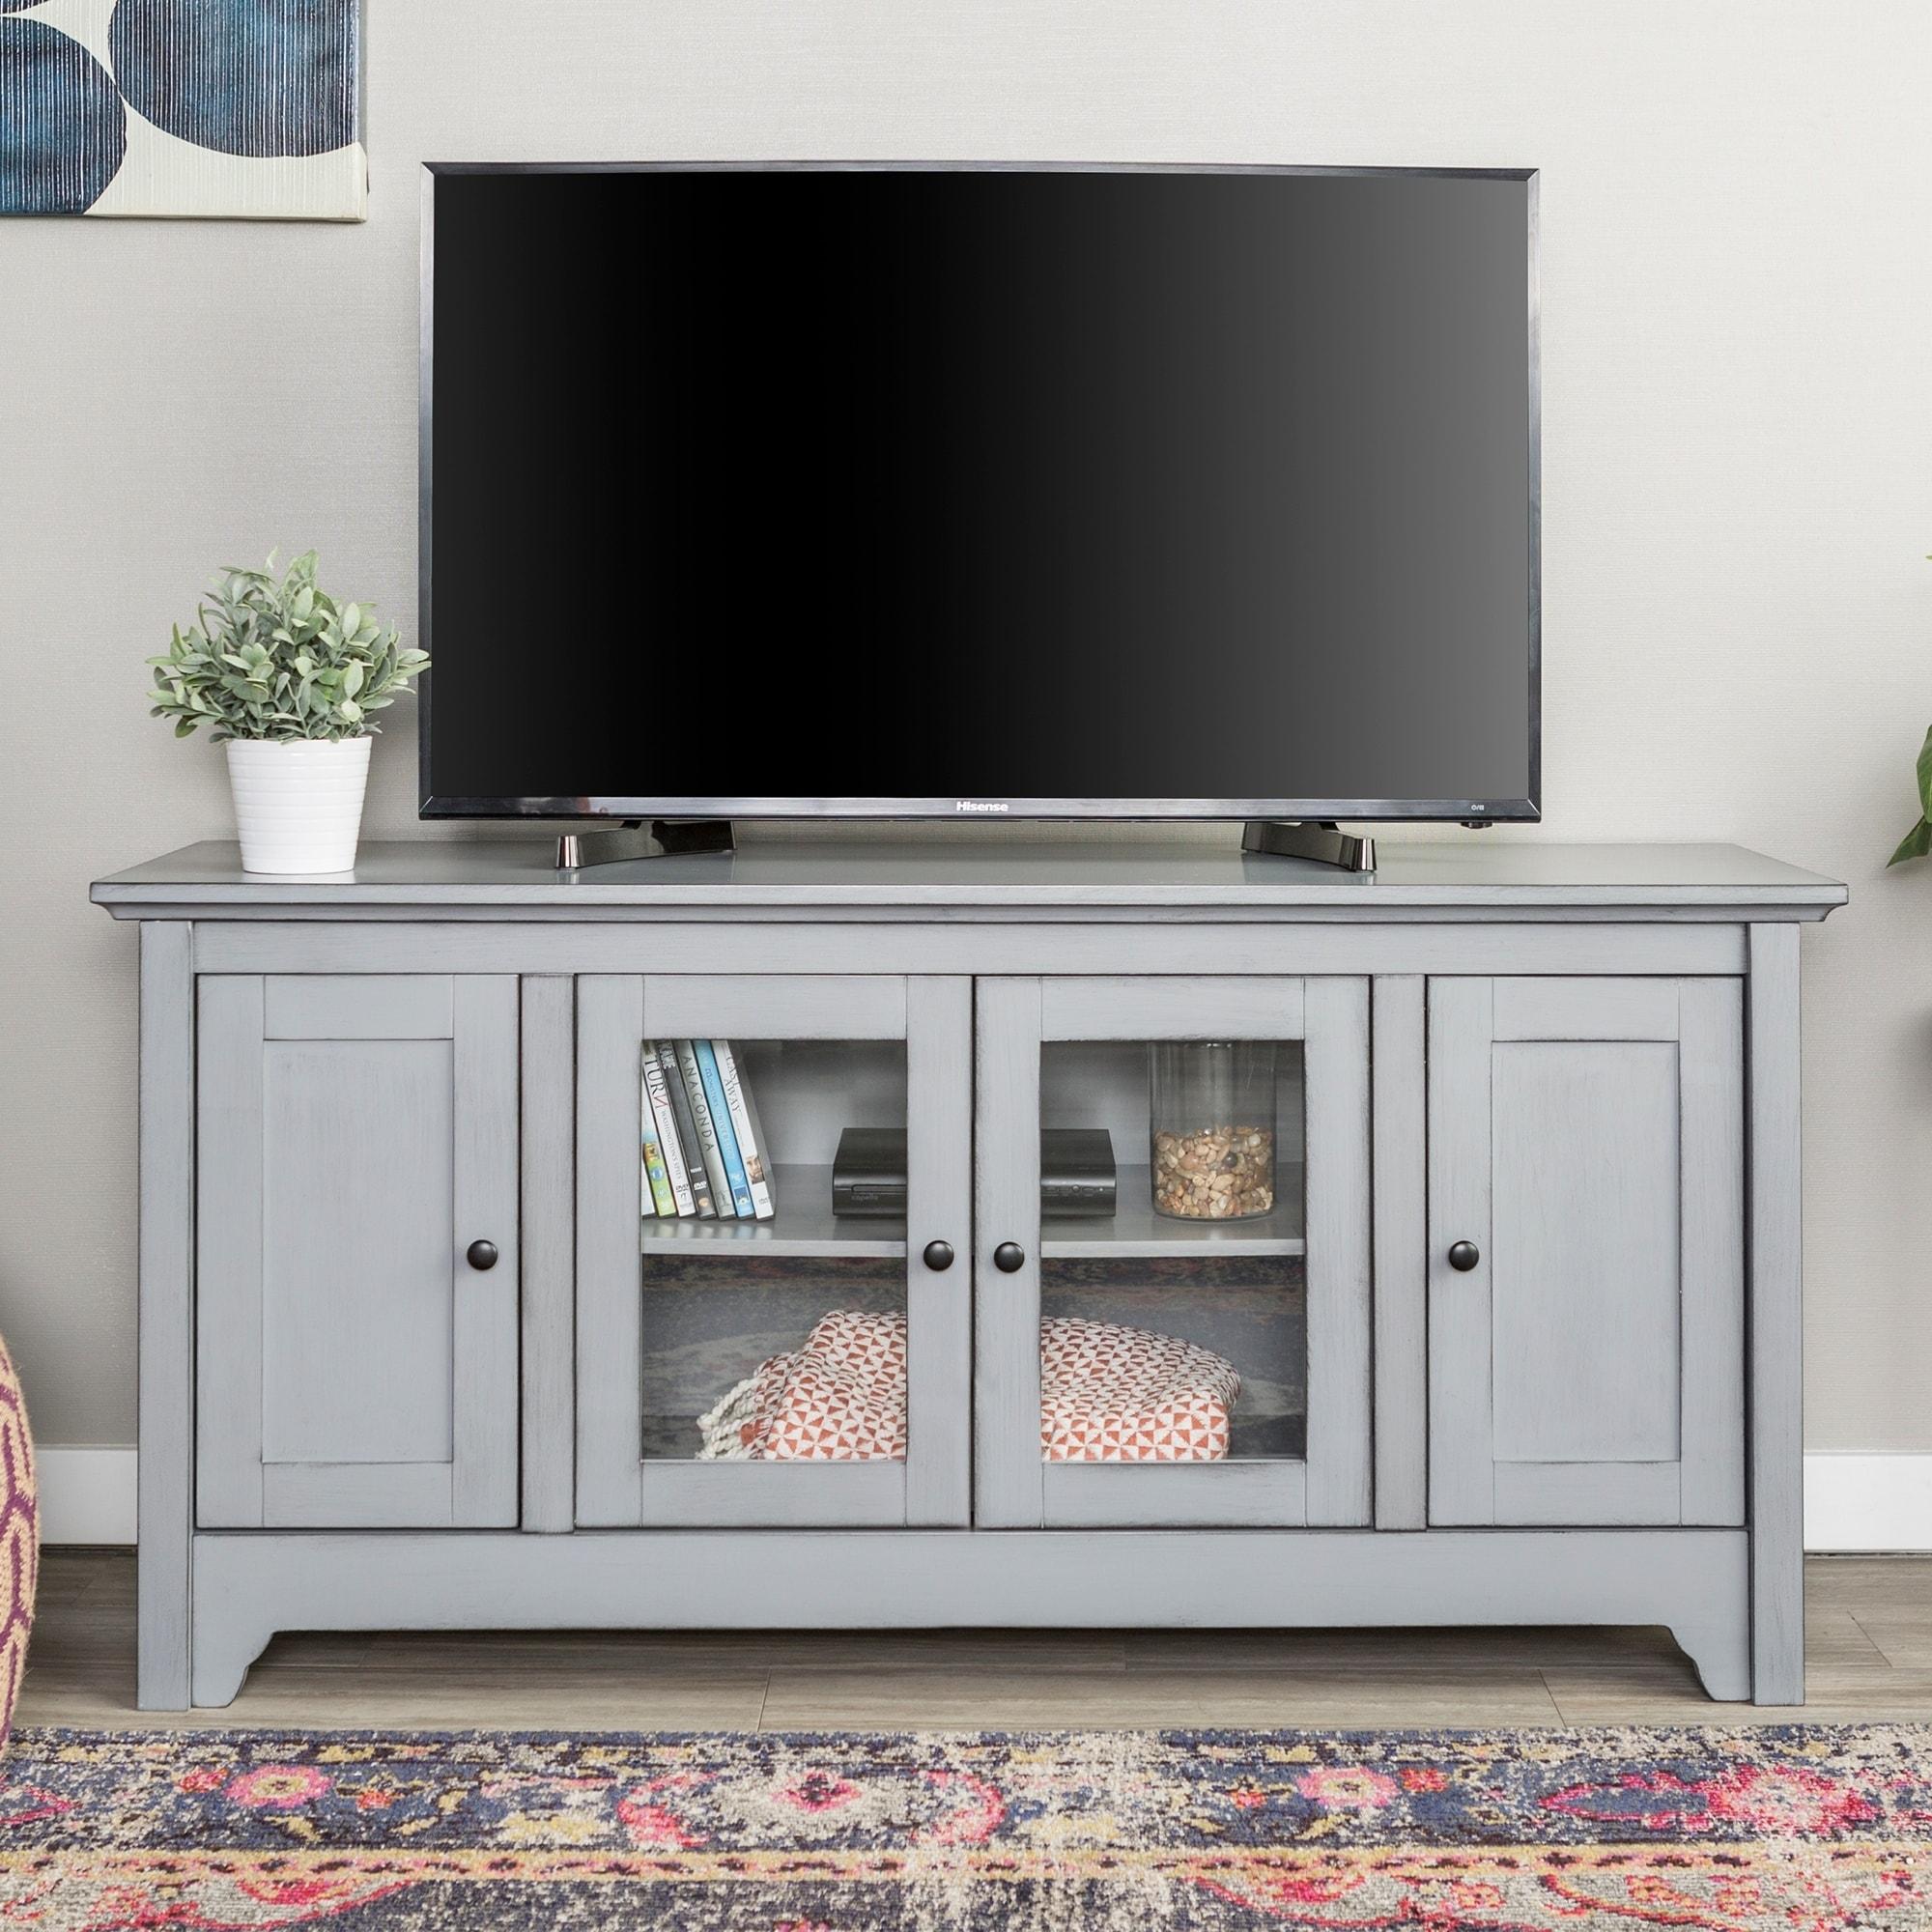 Etonnant The Gray Barn Estelle 52 Inch Wood TV Media Stand Storage Console   53 X 16  X 25h